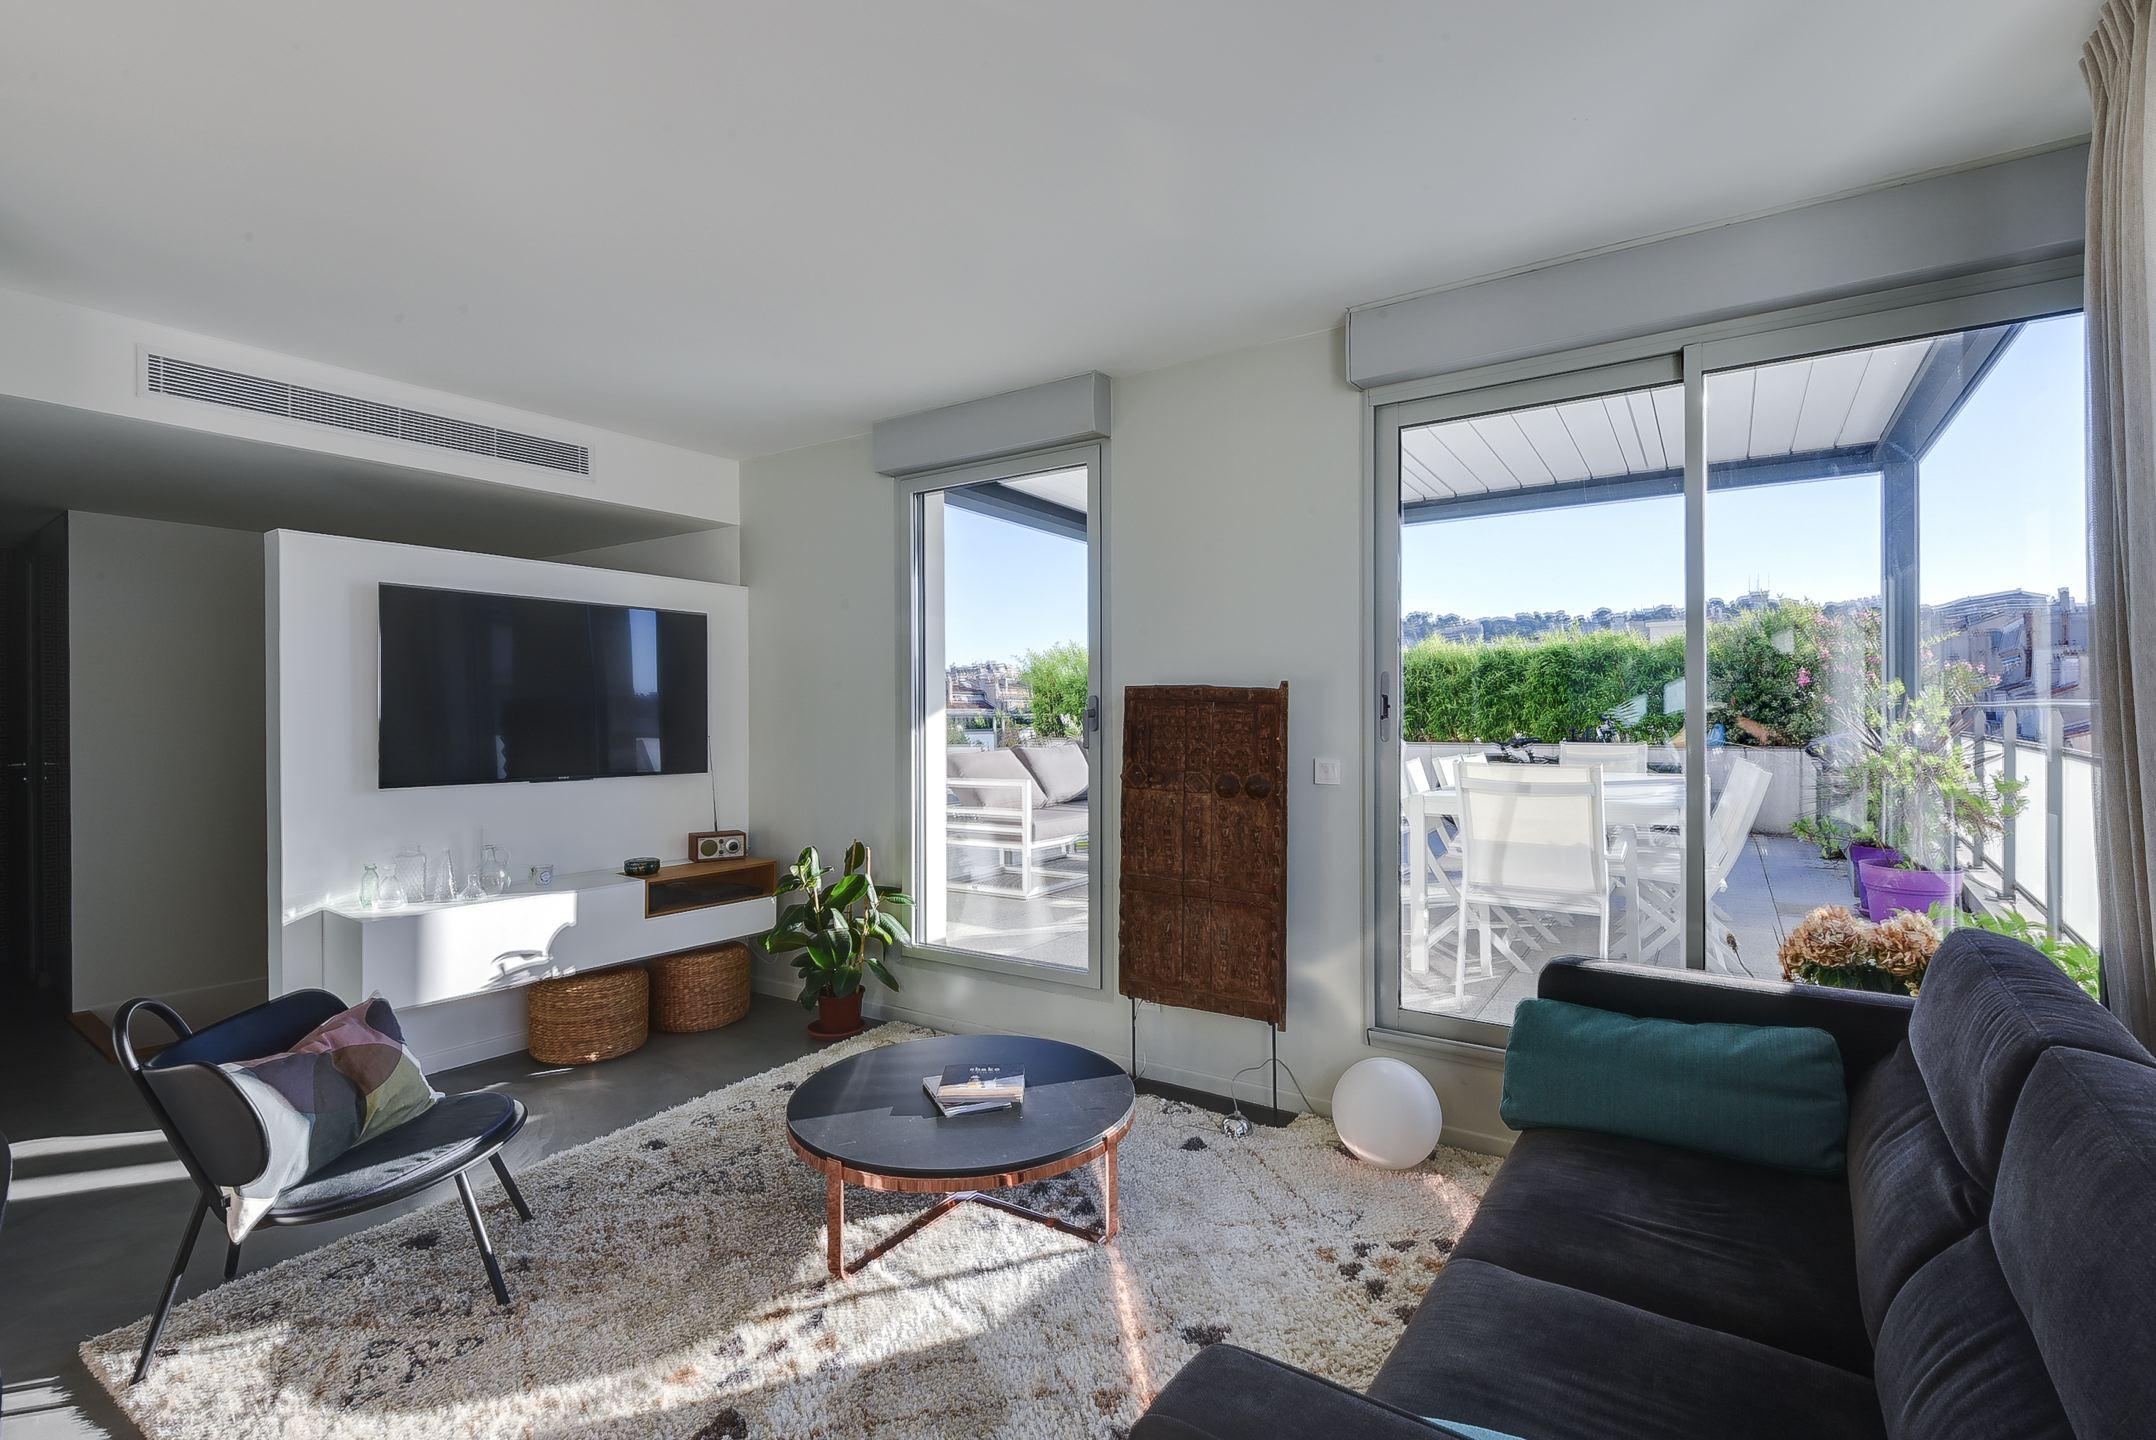 Un beau duplex contemporain avec grande terrasse